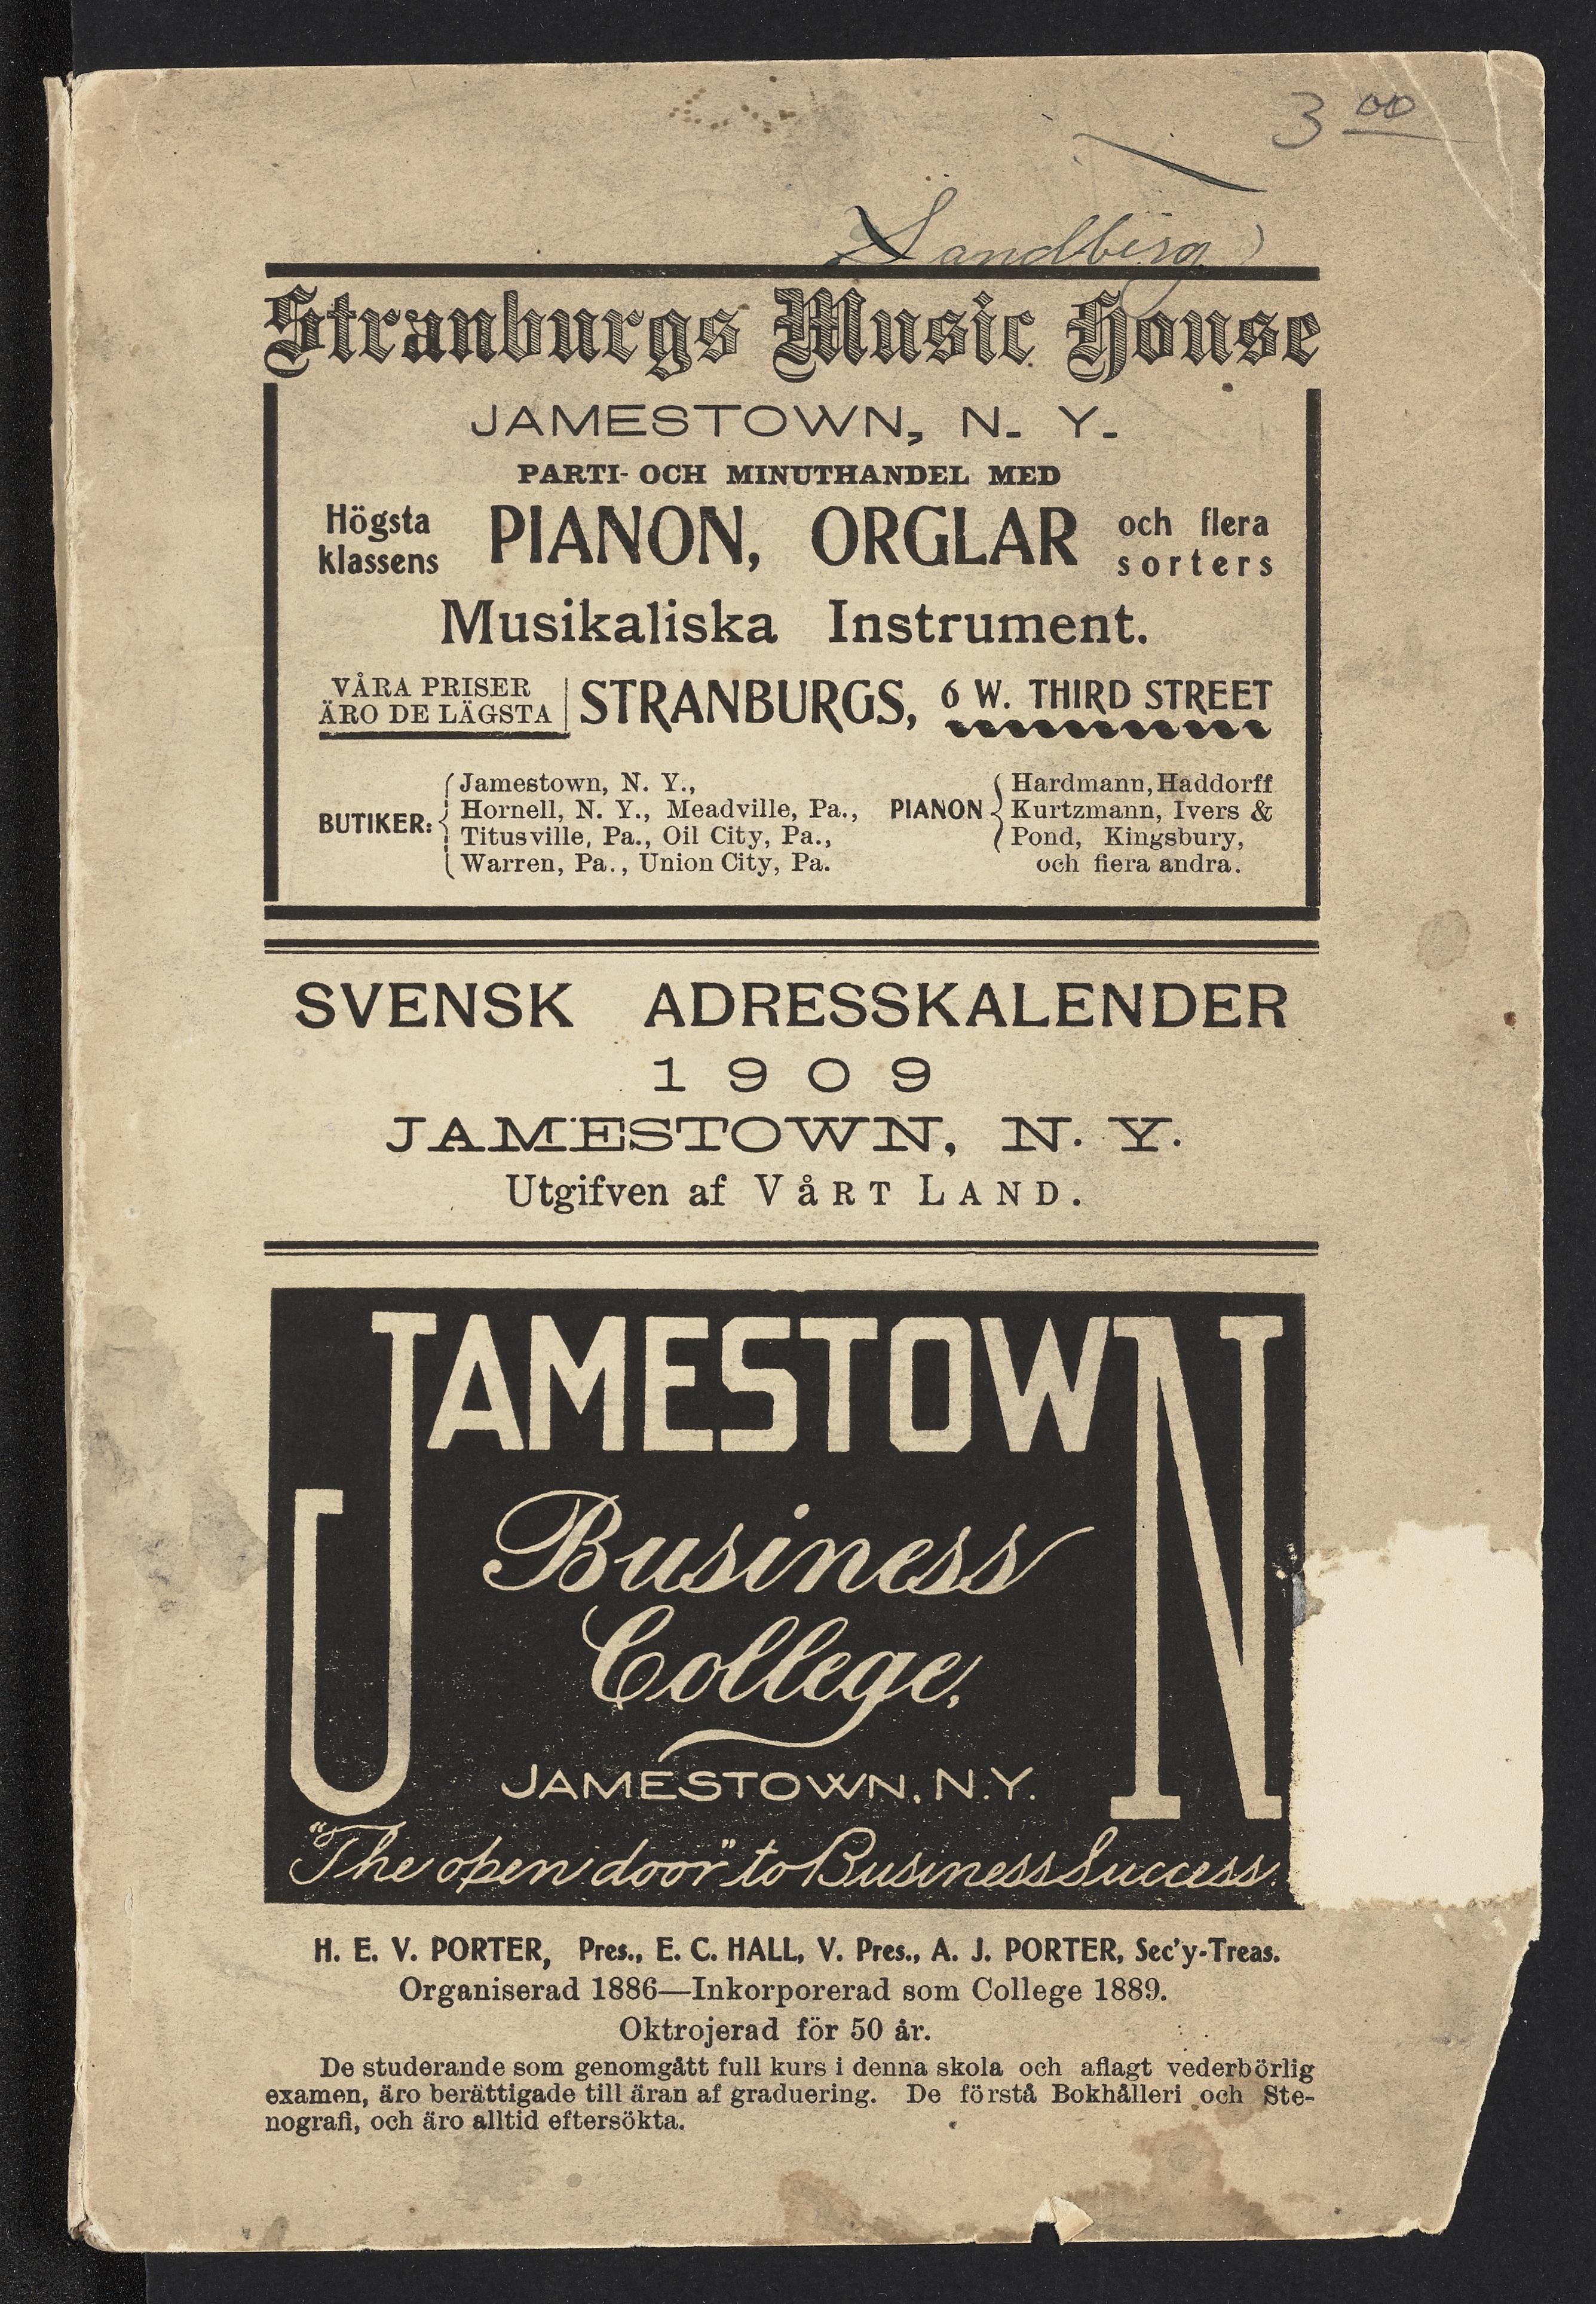 Swedish language directory of Jamestown, NY